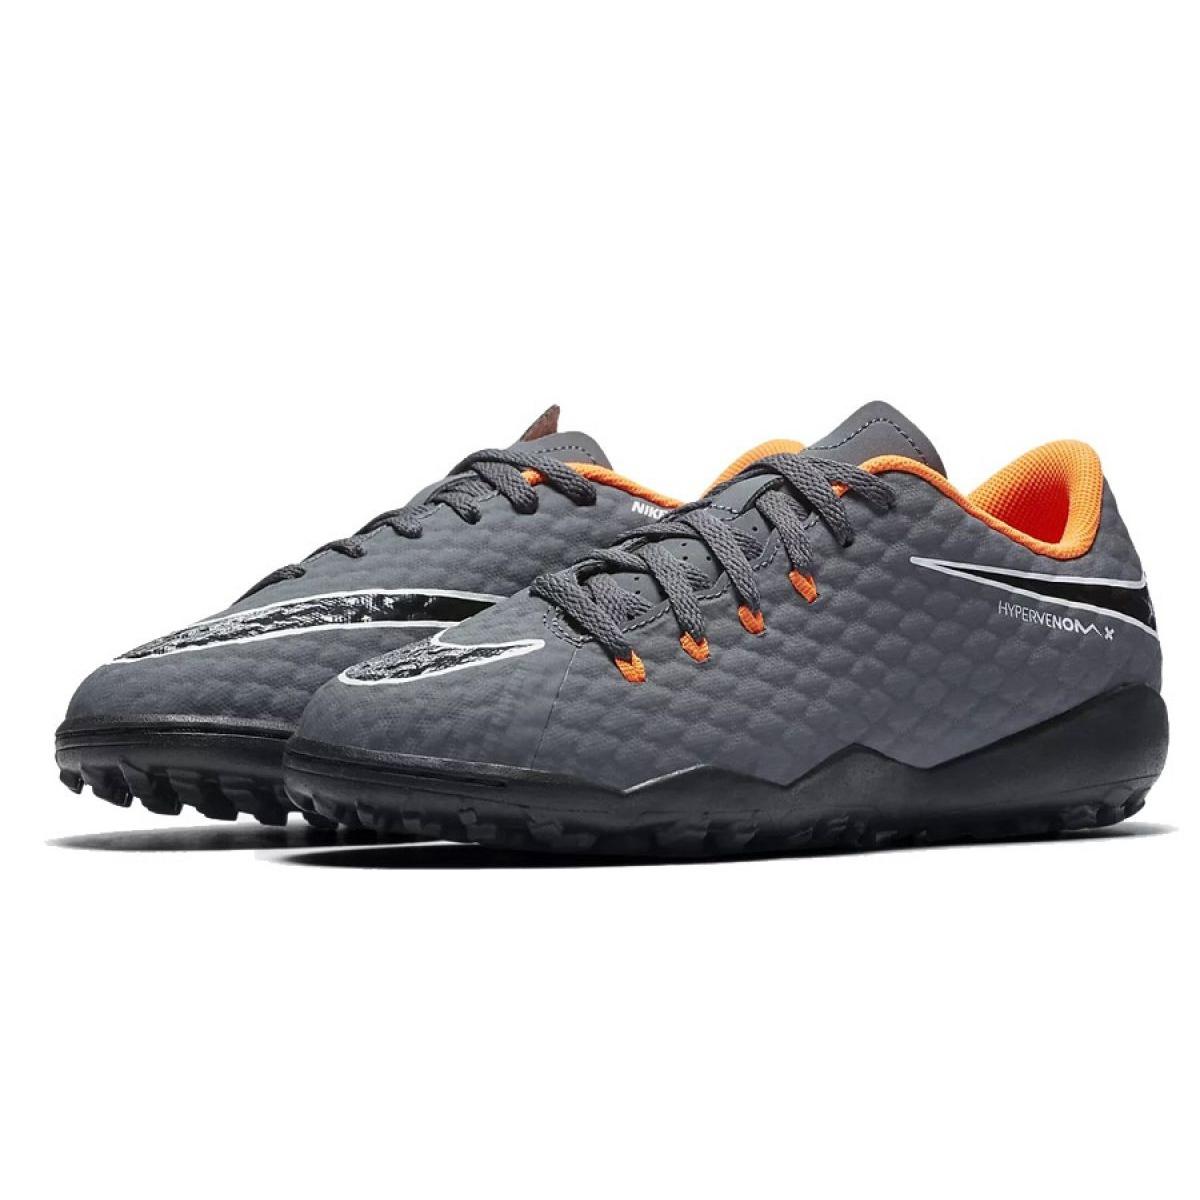 quality design f7ff3 c5b3e Nike Hypervenom PhantomX 3 Academy Tf Jr AH7294-081-S Football Boots